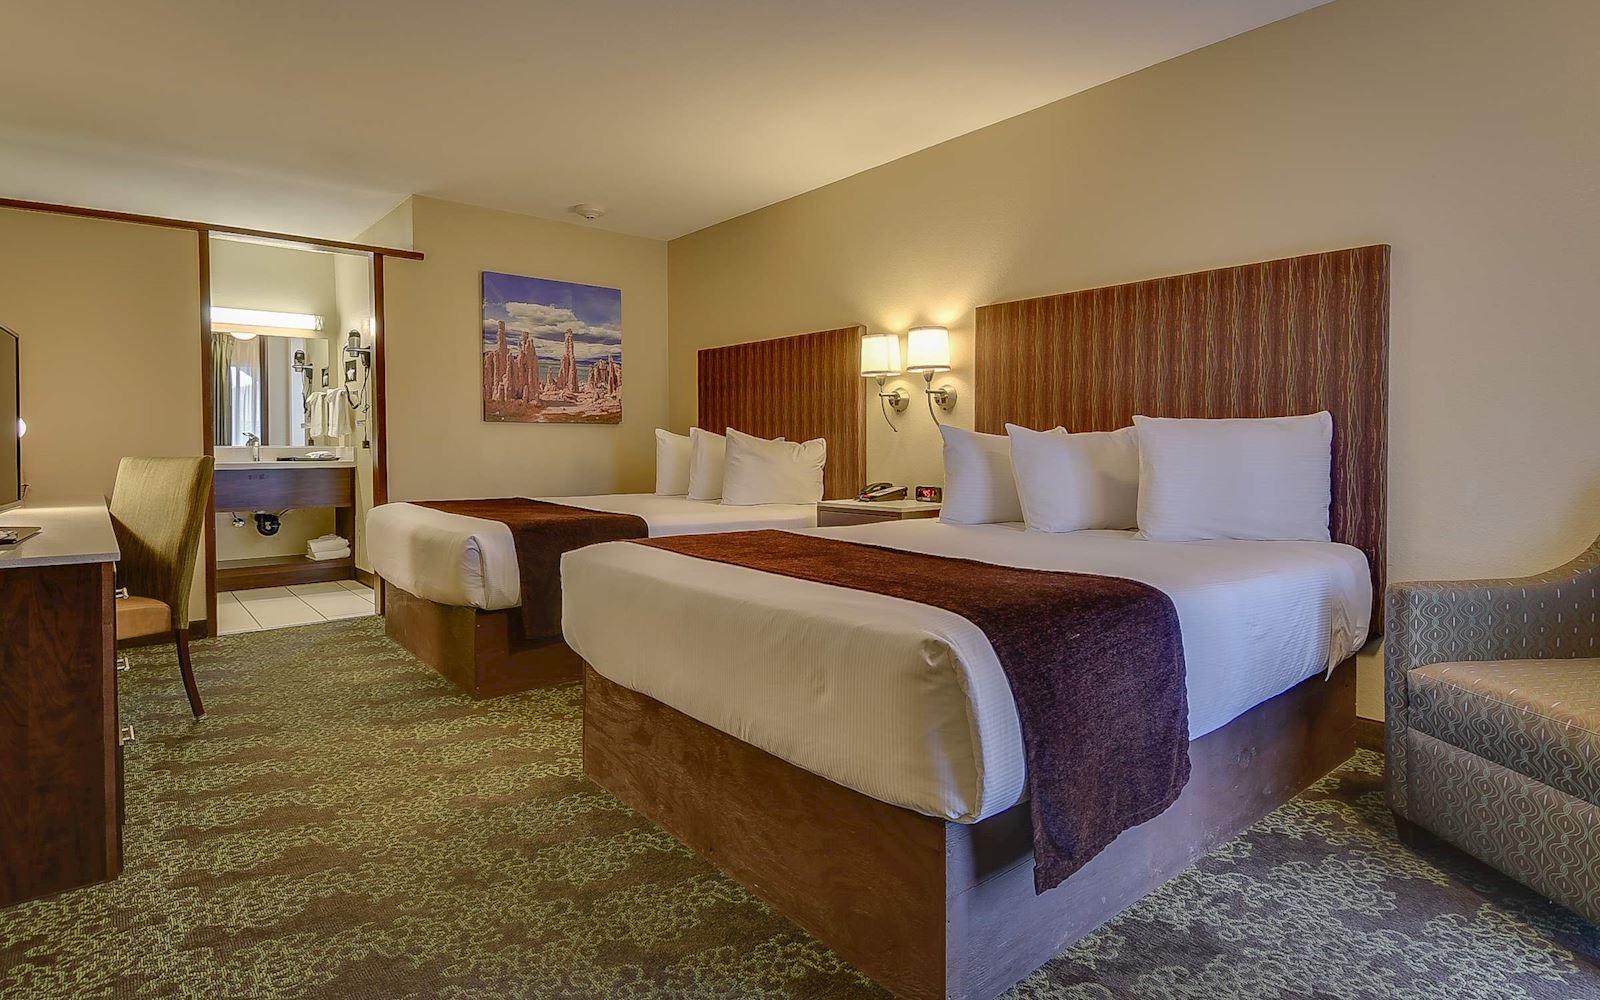 Bishop California Hotel Vagabond Inn Bisop